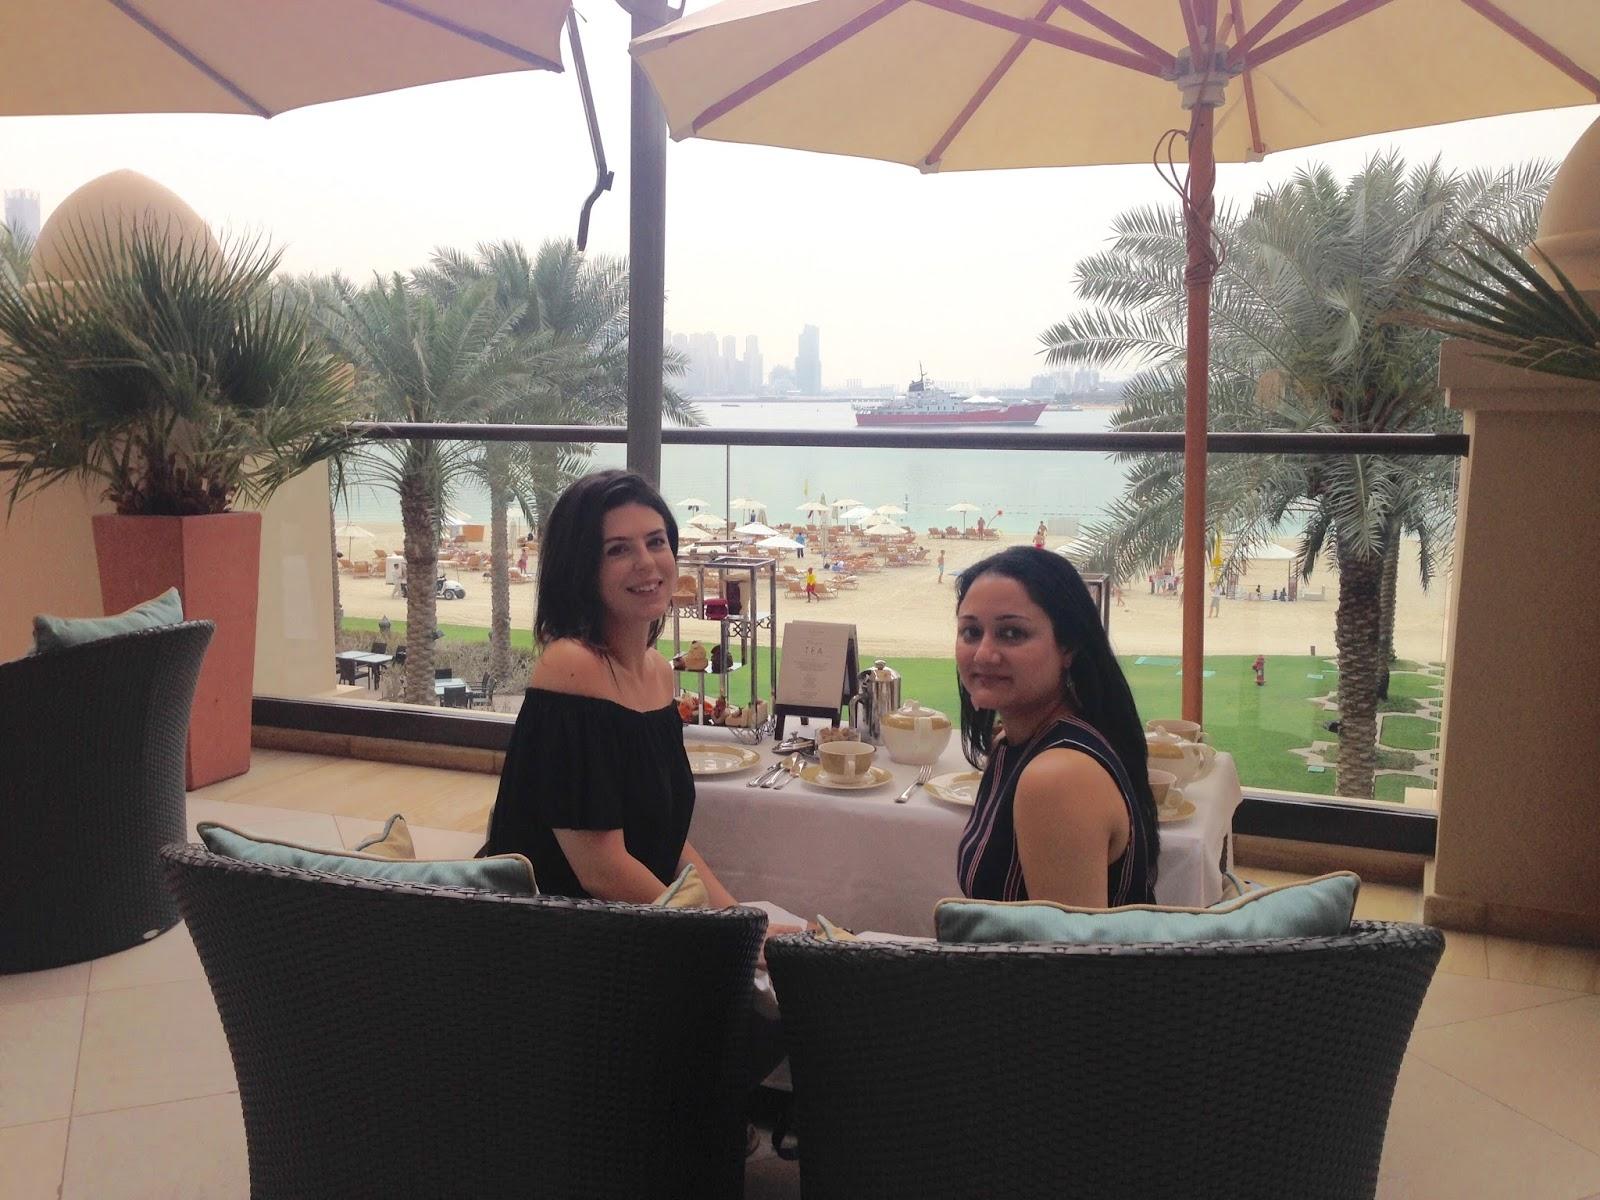 Afternoon tea at Fairmont The Palm Dubai